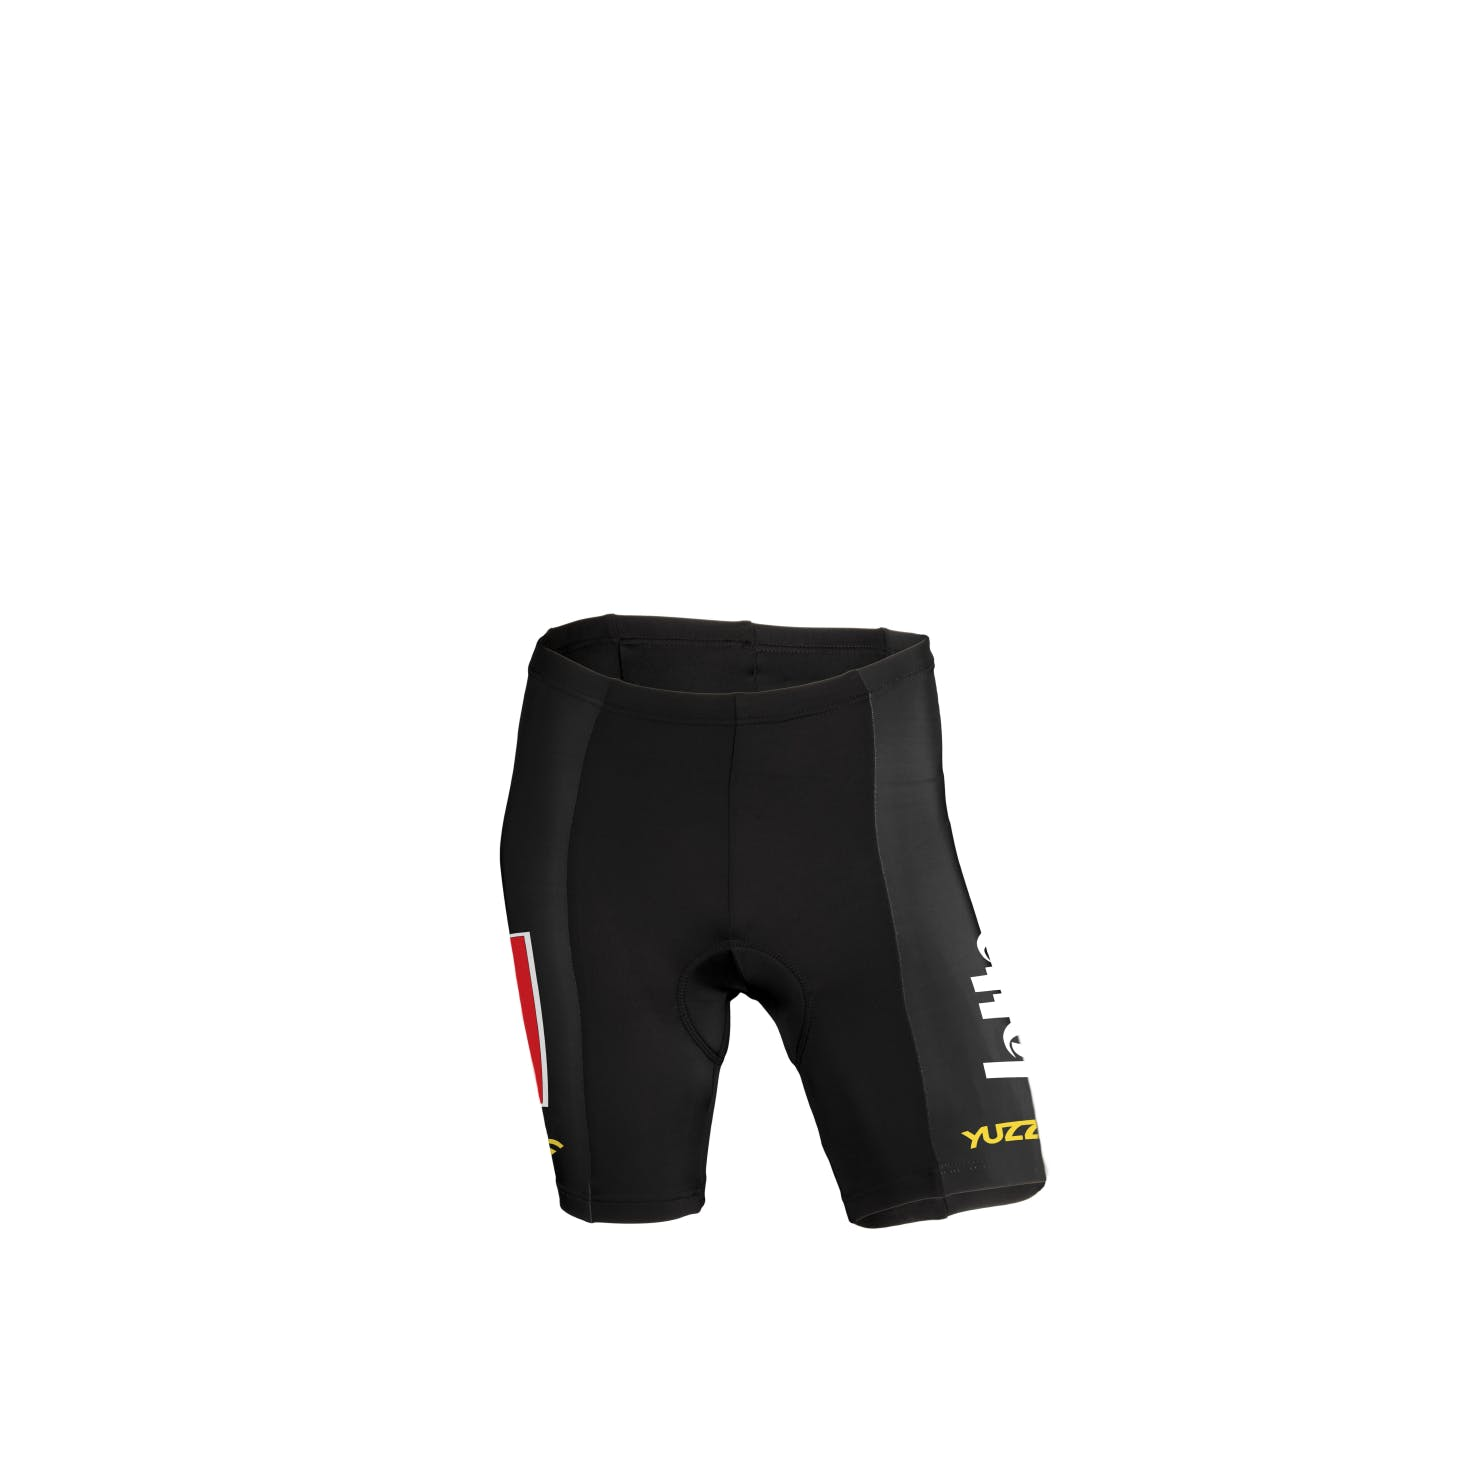 Soudal Lotto 2021 Shorts Kids